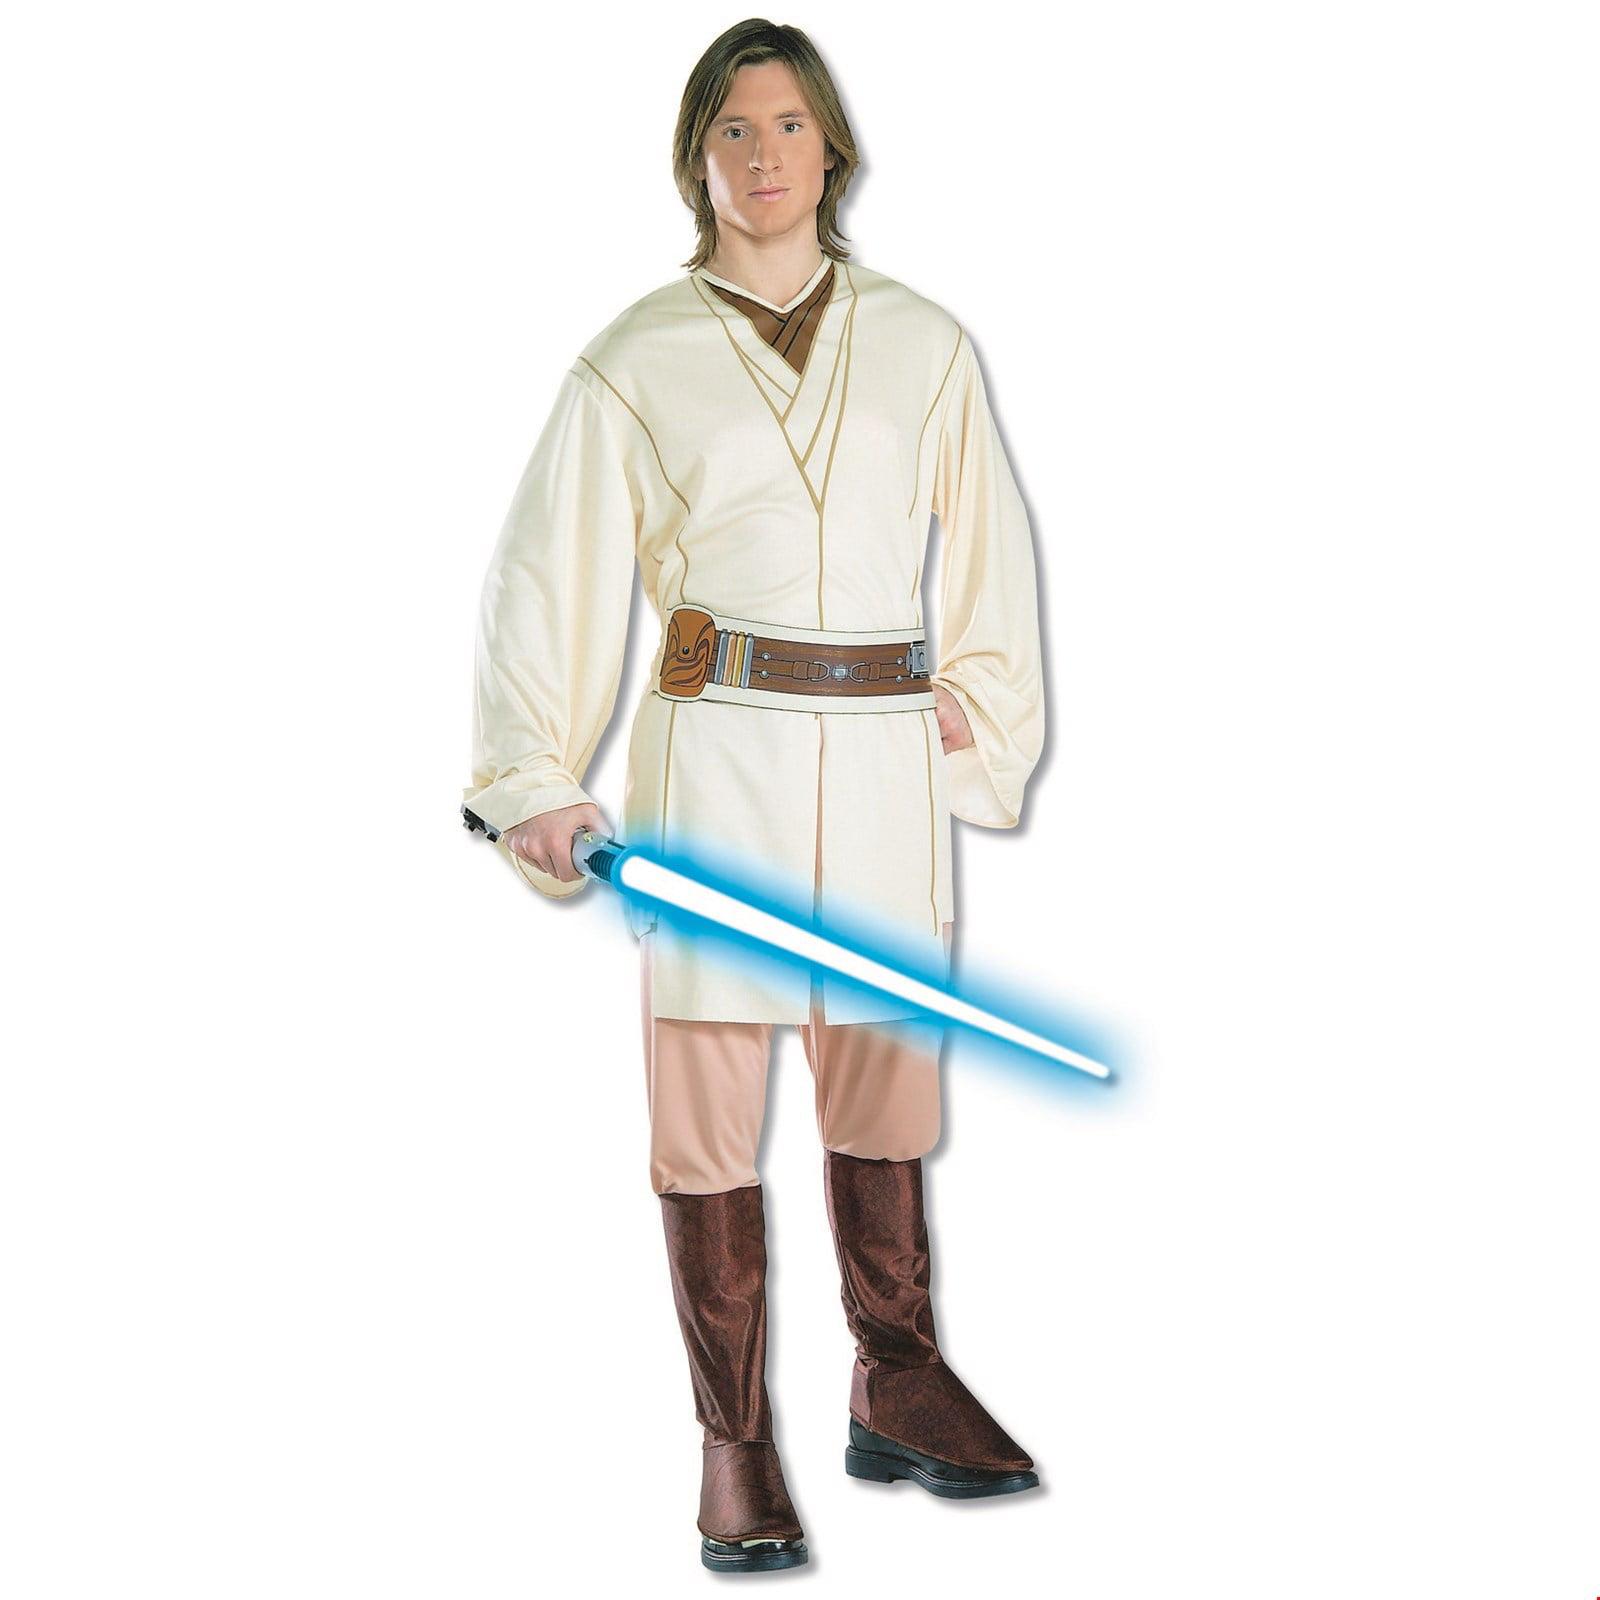 jedi costume accessories | www.topsimages